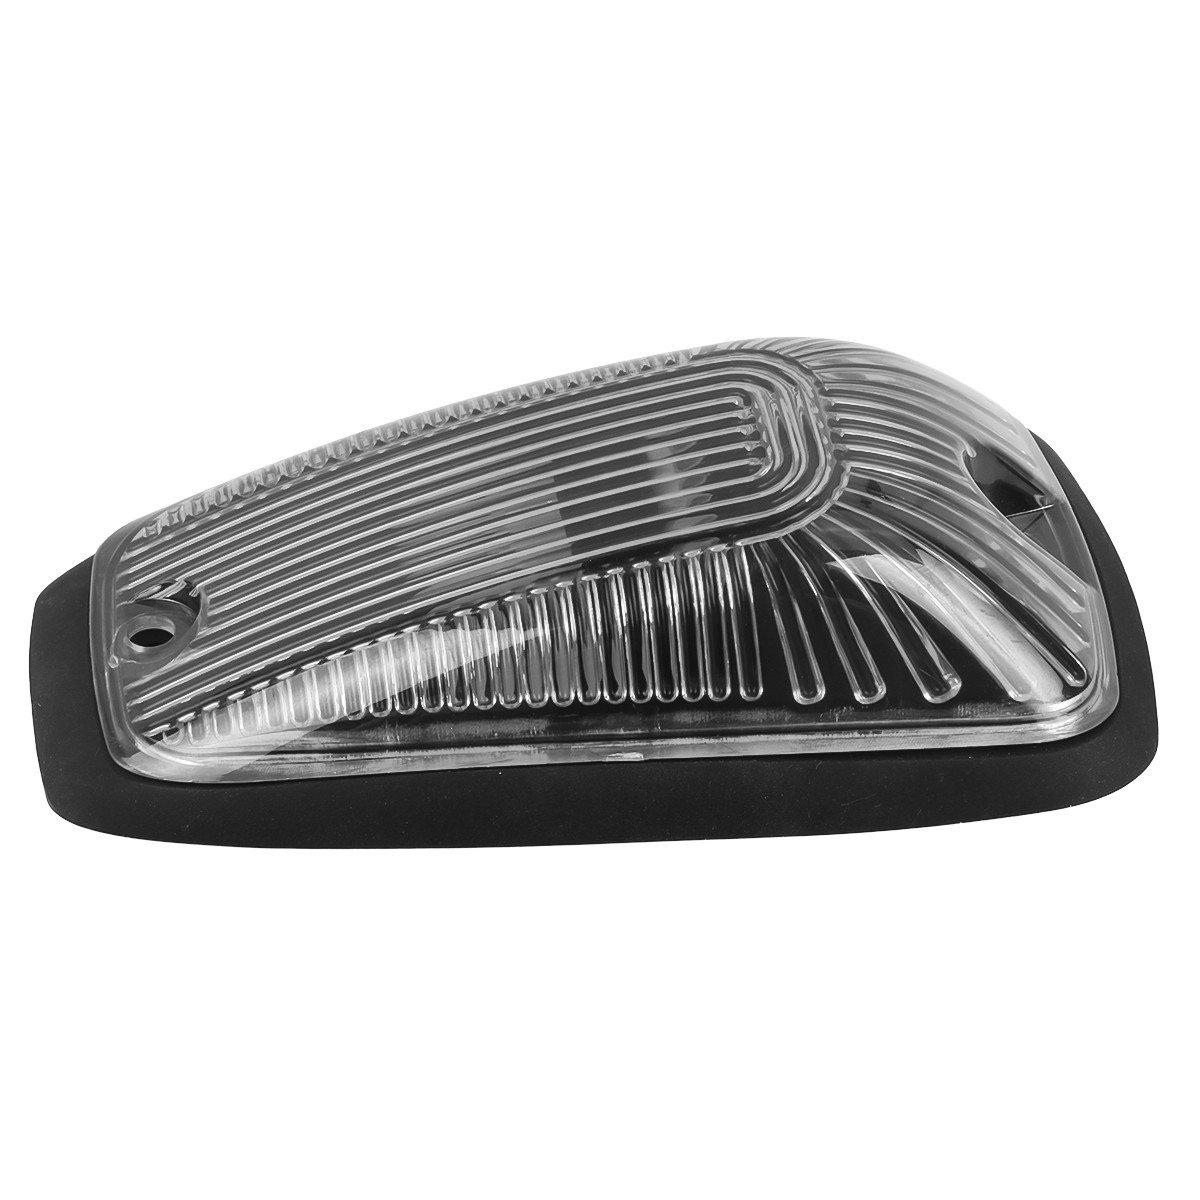 Partsam 5X Smoke Cab Roof Top Marker Cover//Base Compatible with Chevy//GMC C1500 C2500 C3500 C5500 C6000 C6500 C7000 C7500 K1500 K2500 K3500 K5500 K6000 K6500 K7000 K7500 1988-2002 Kodiak Topkick